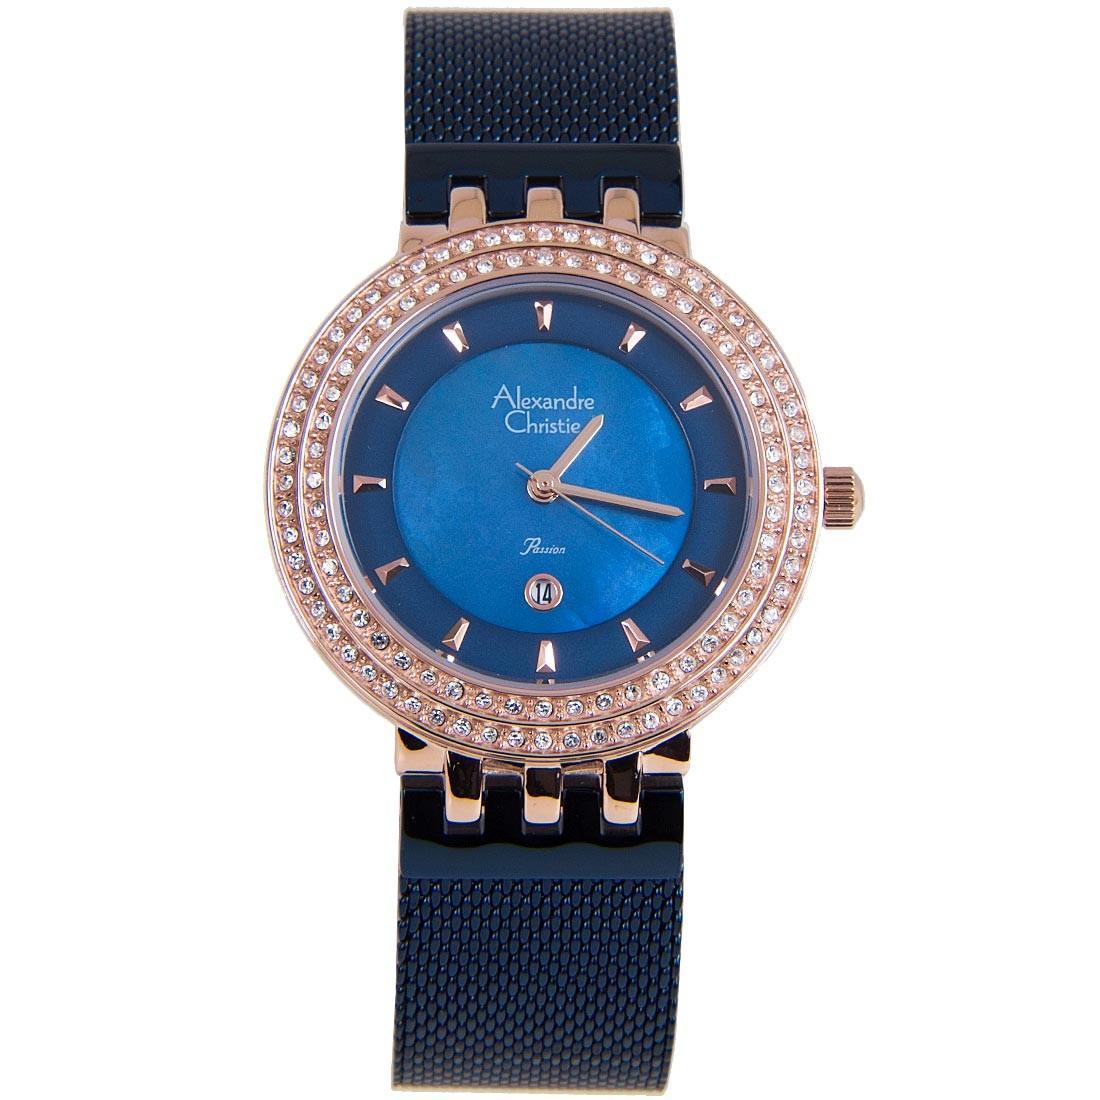 Latest Alexandre Christie Watches Products Enjoy Huge Discounts Ac 6410 Mc Steel Silver Black White Passion Women Business Watch 2651ldburbu